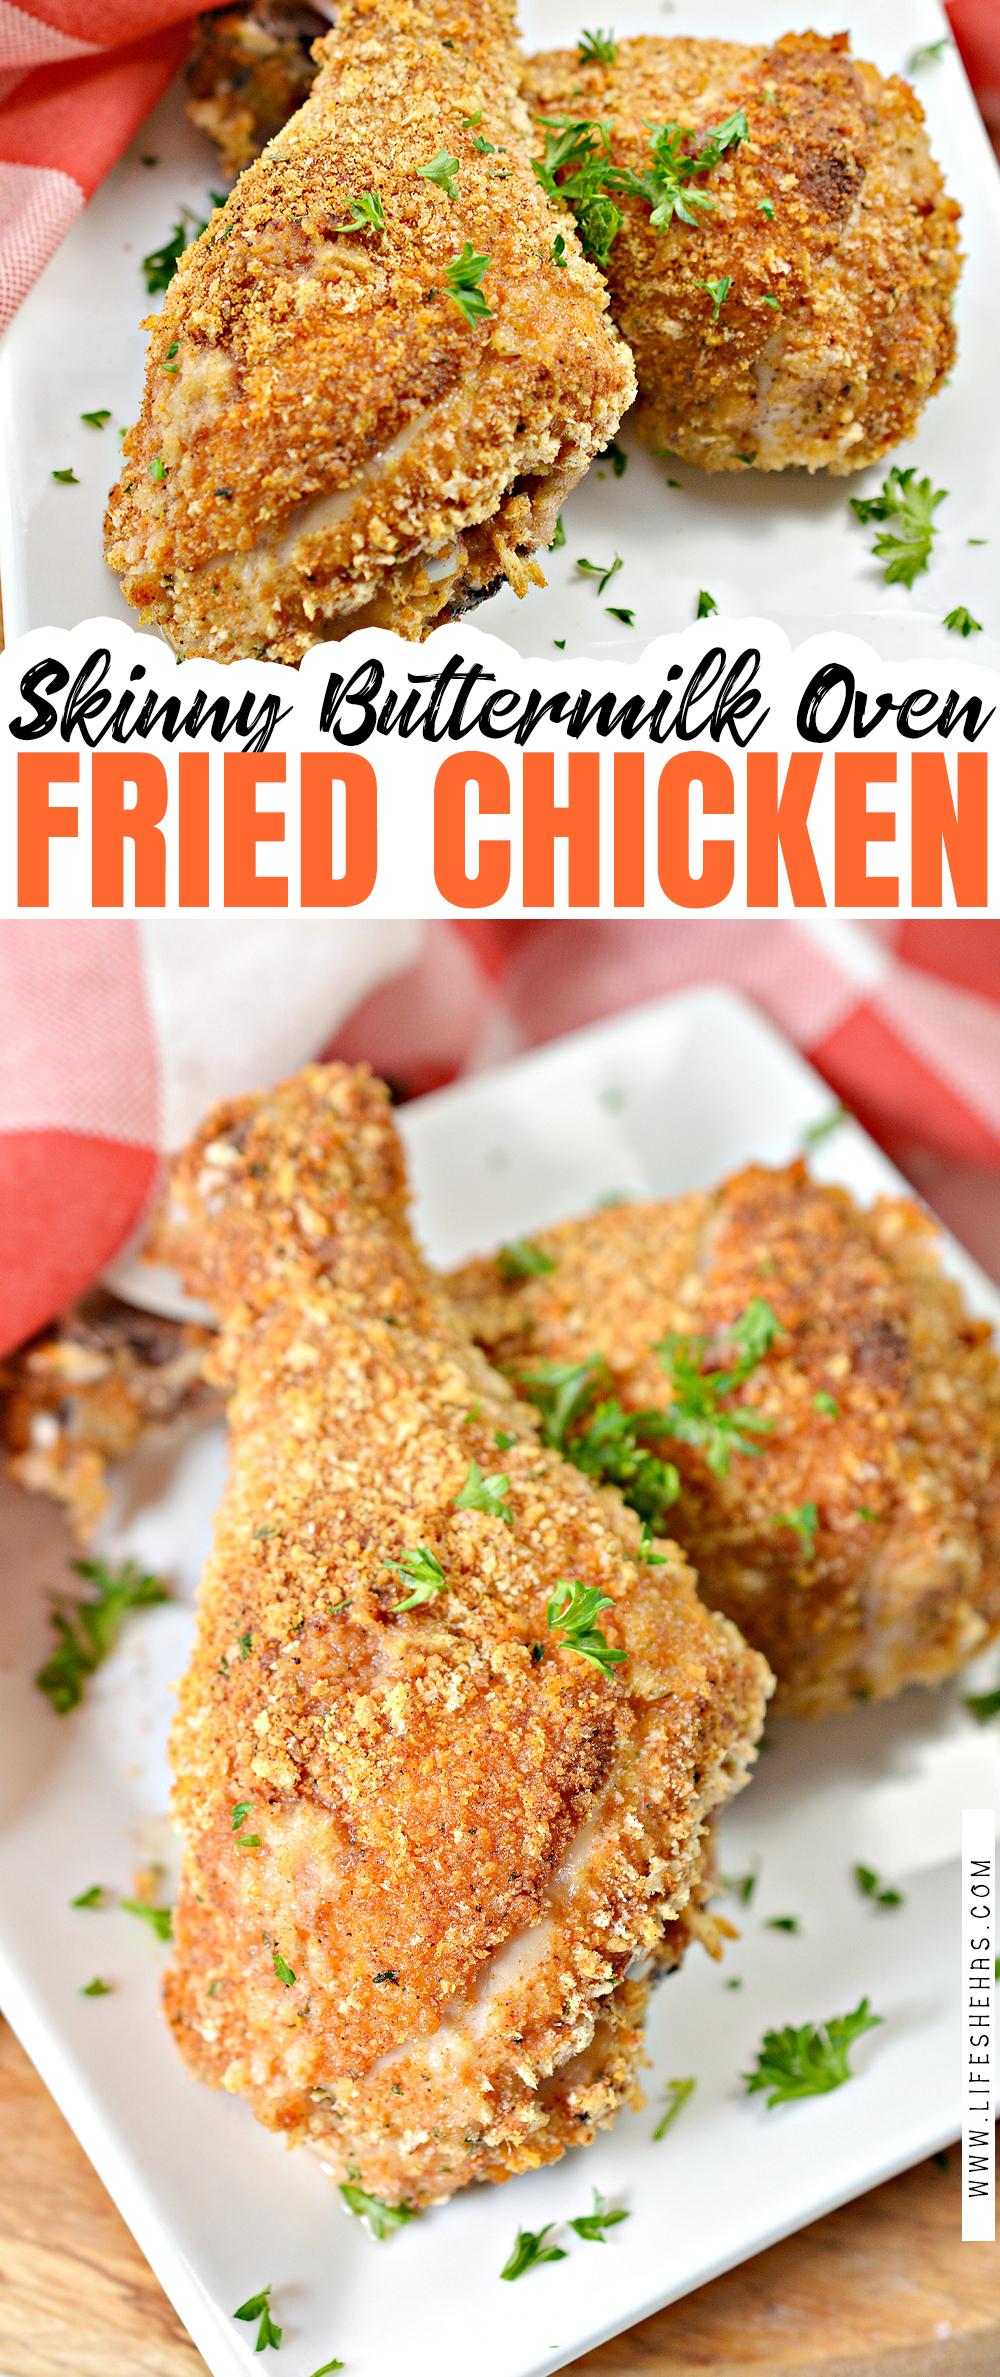 Skinny Buttermilk Oven Fried Chicken